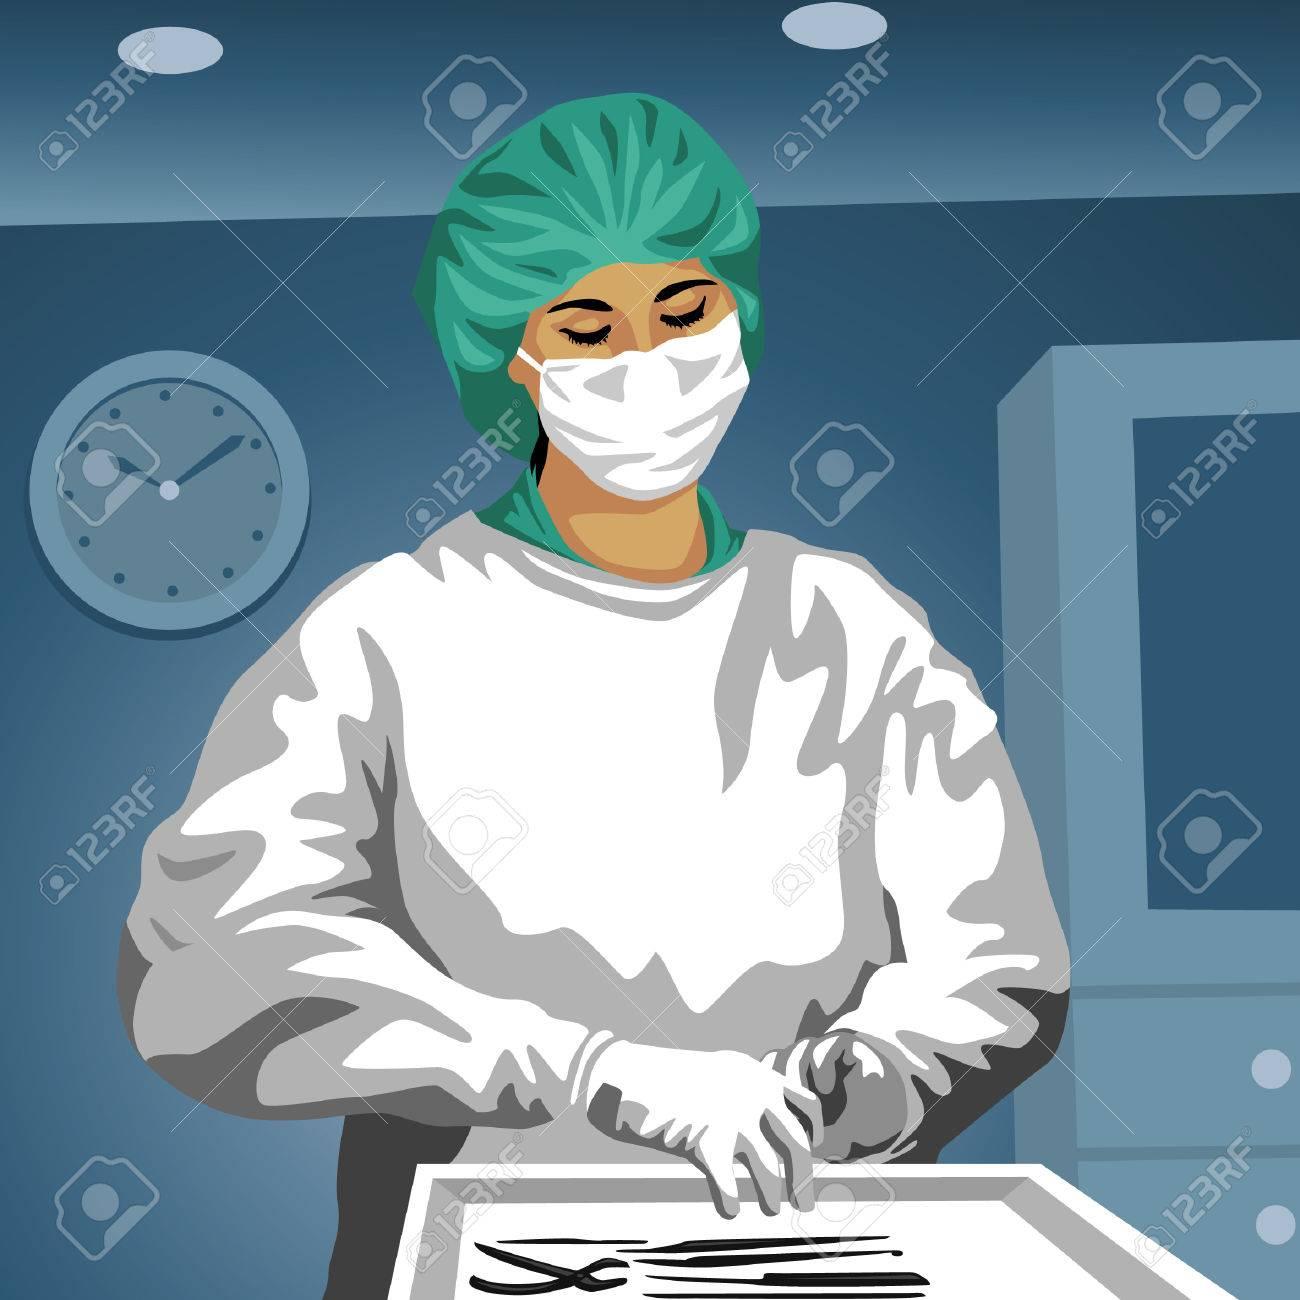 Anime Surgeon cirujano femenino  Profesion